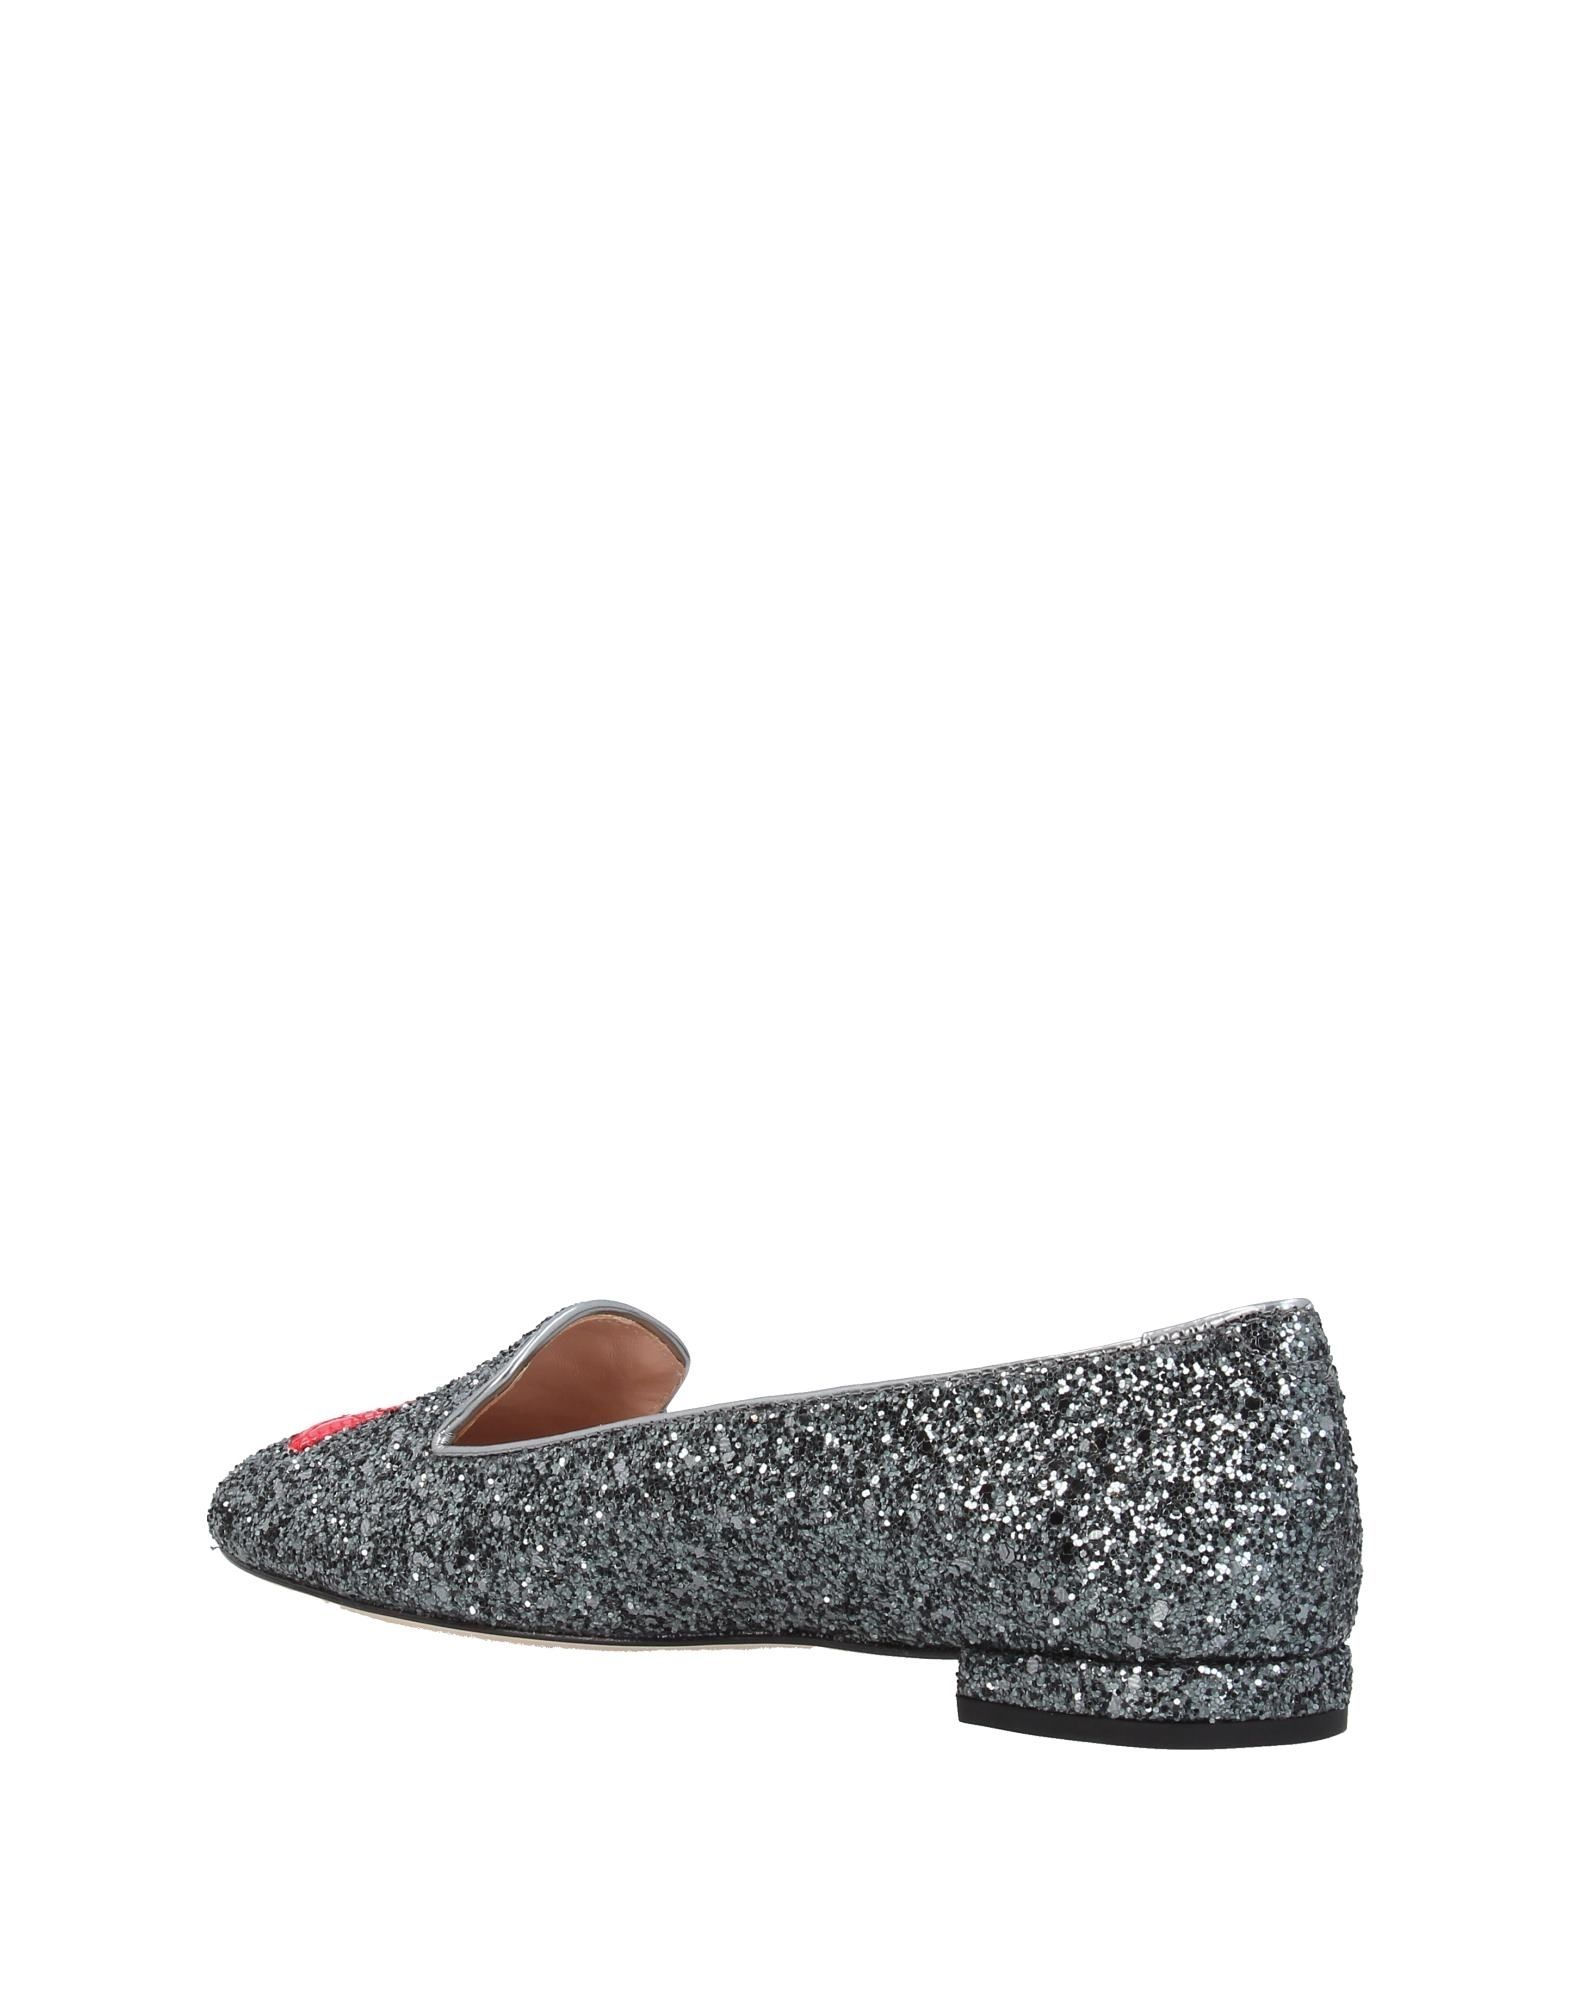 Stilvolle Stilvolle Stilvolle billige Schuhe Chiara Ferragni Ballerinas Damen  11395886GA 6b26e5